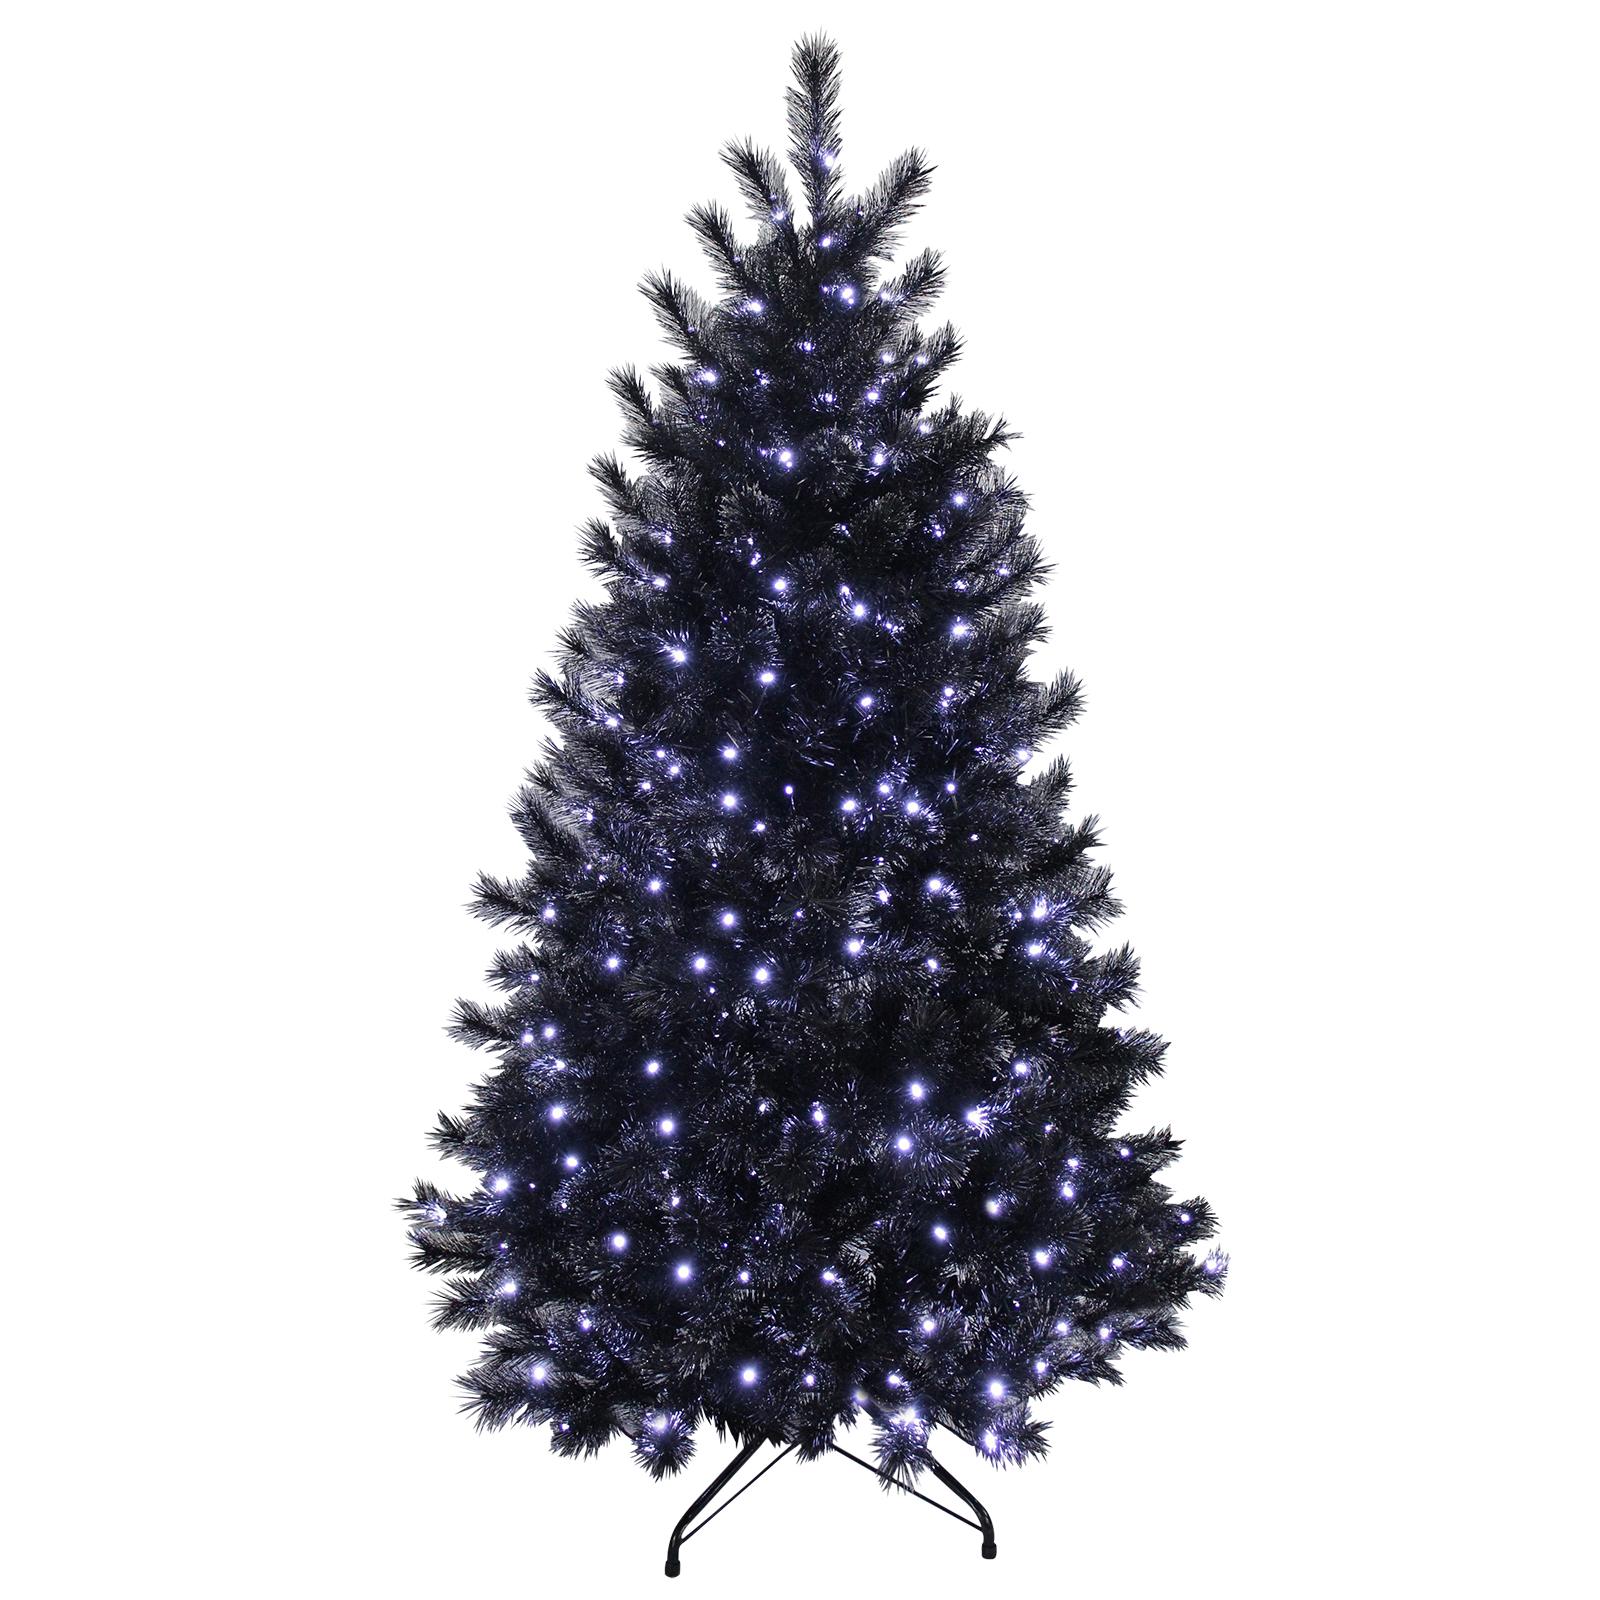 Ebay Christmas Tree: Black Glitter Pine Artificial Pre-Lit Bright White Lights